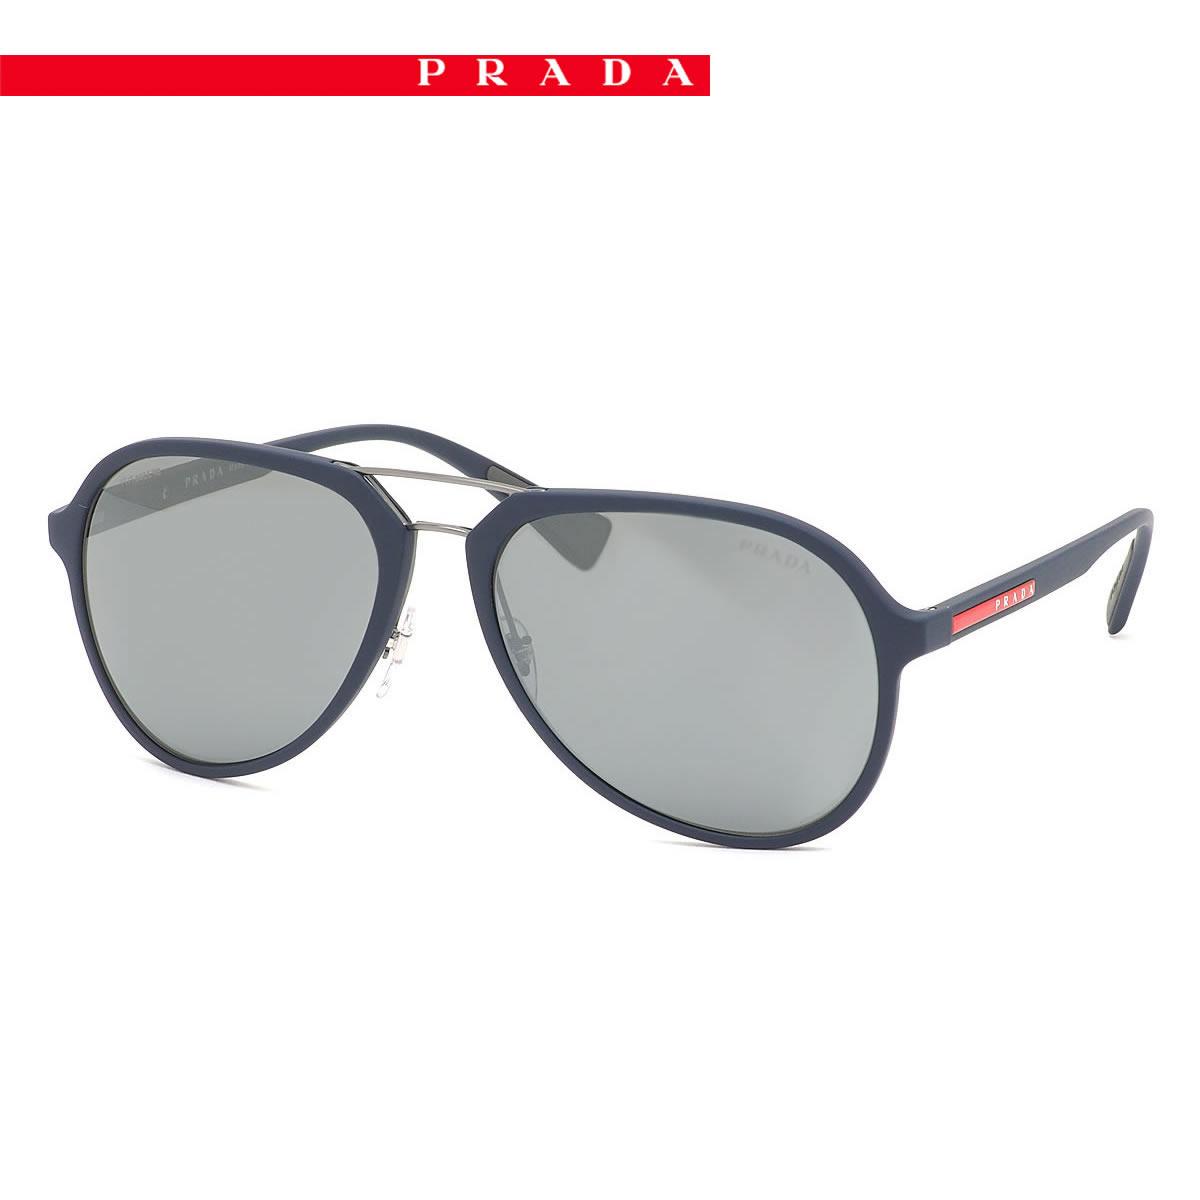 5c9fbb868c (PRADA SPORT) sunglasses PS05RS TFY7W1 58 size PRADA SPORTS line aross LINEA  ROSSA rubber frame PRADASPORT men women